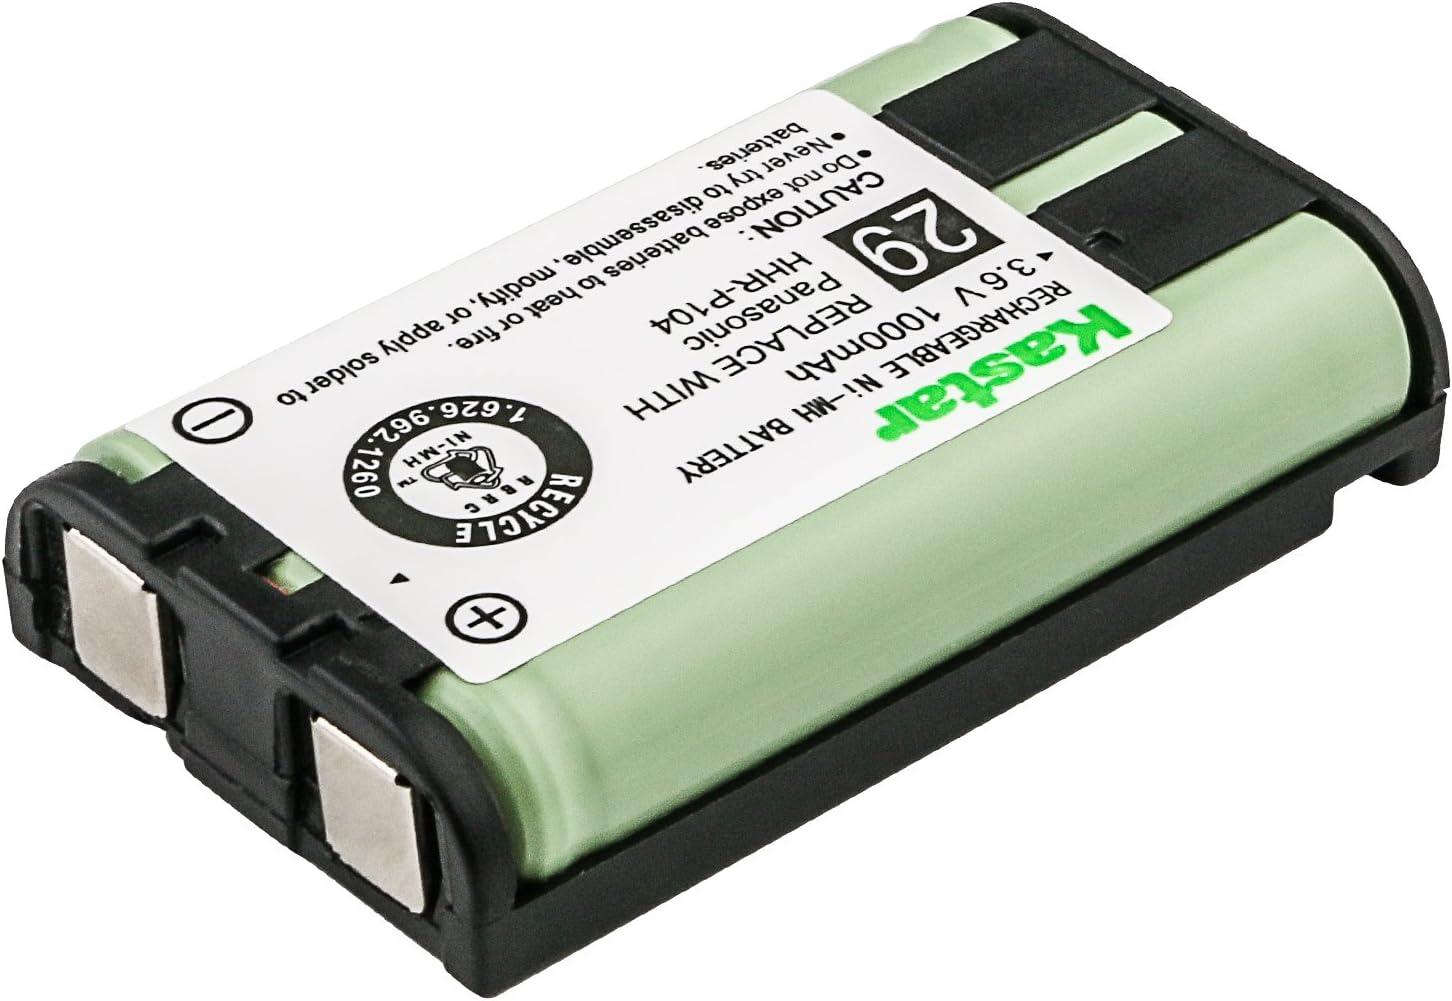 Max 84% OFF Panasonic KX-TG5432 Elegant Cordless Phone Replacement Battery F